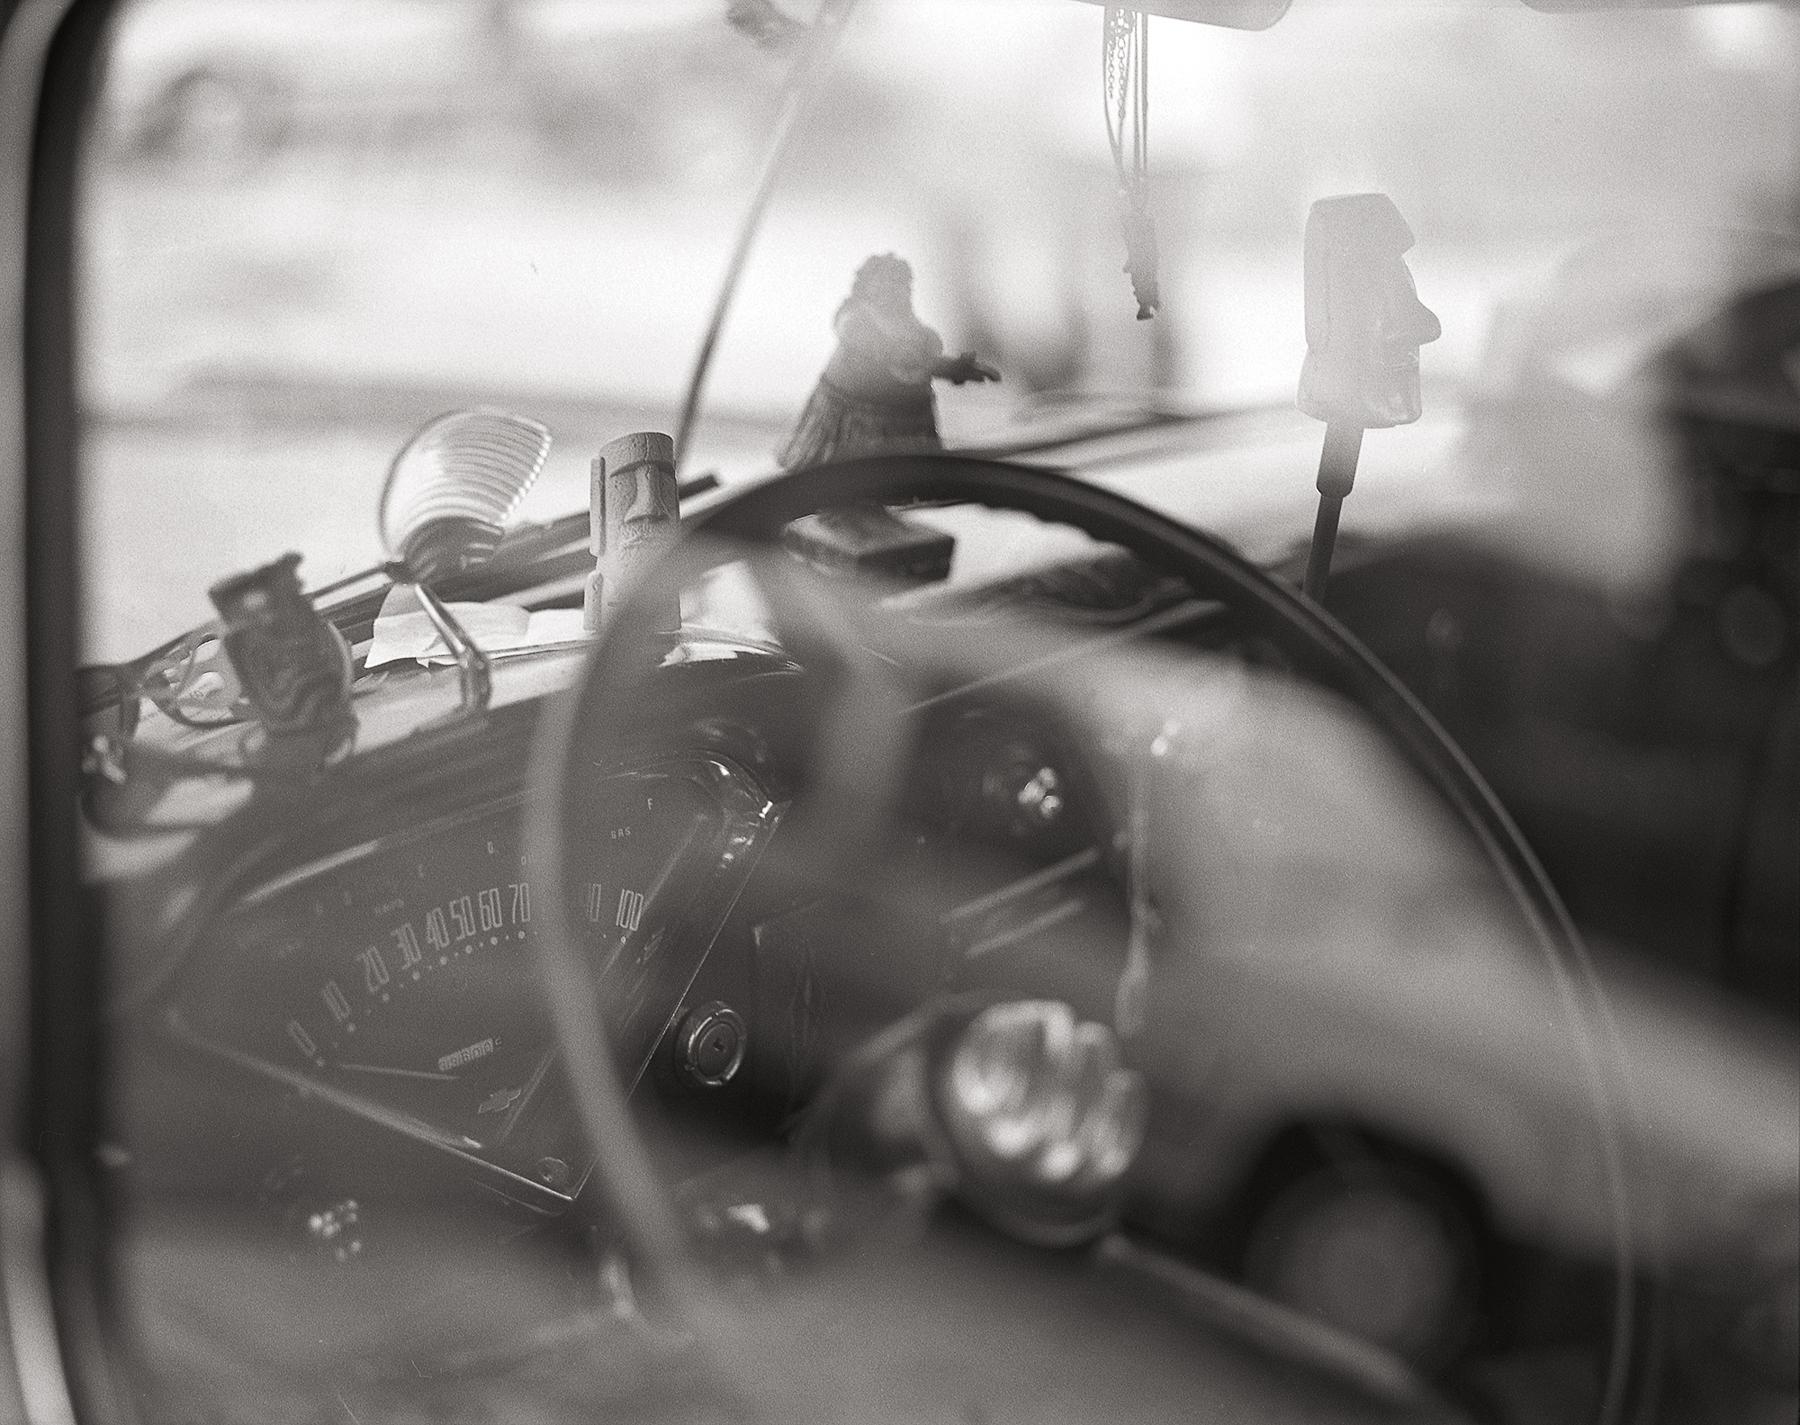 yokrshire-film-photographer-09.jpg